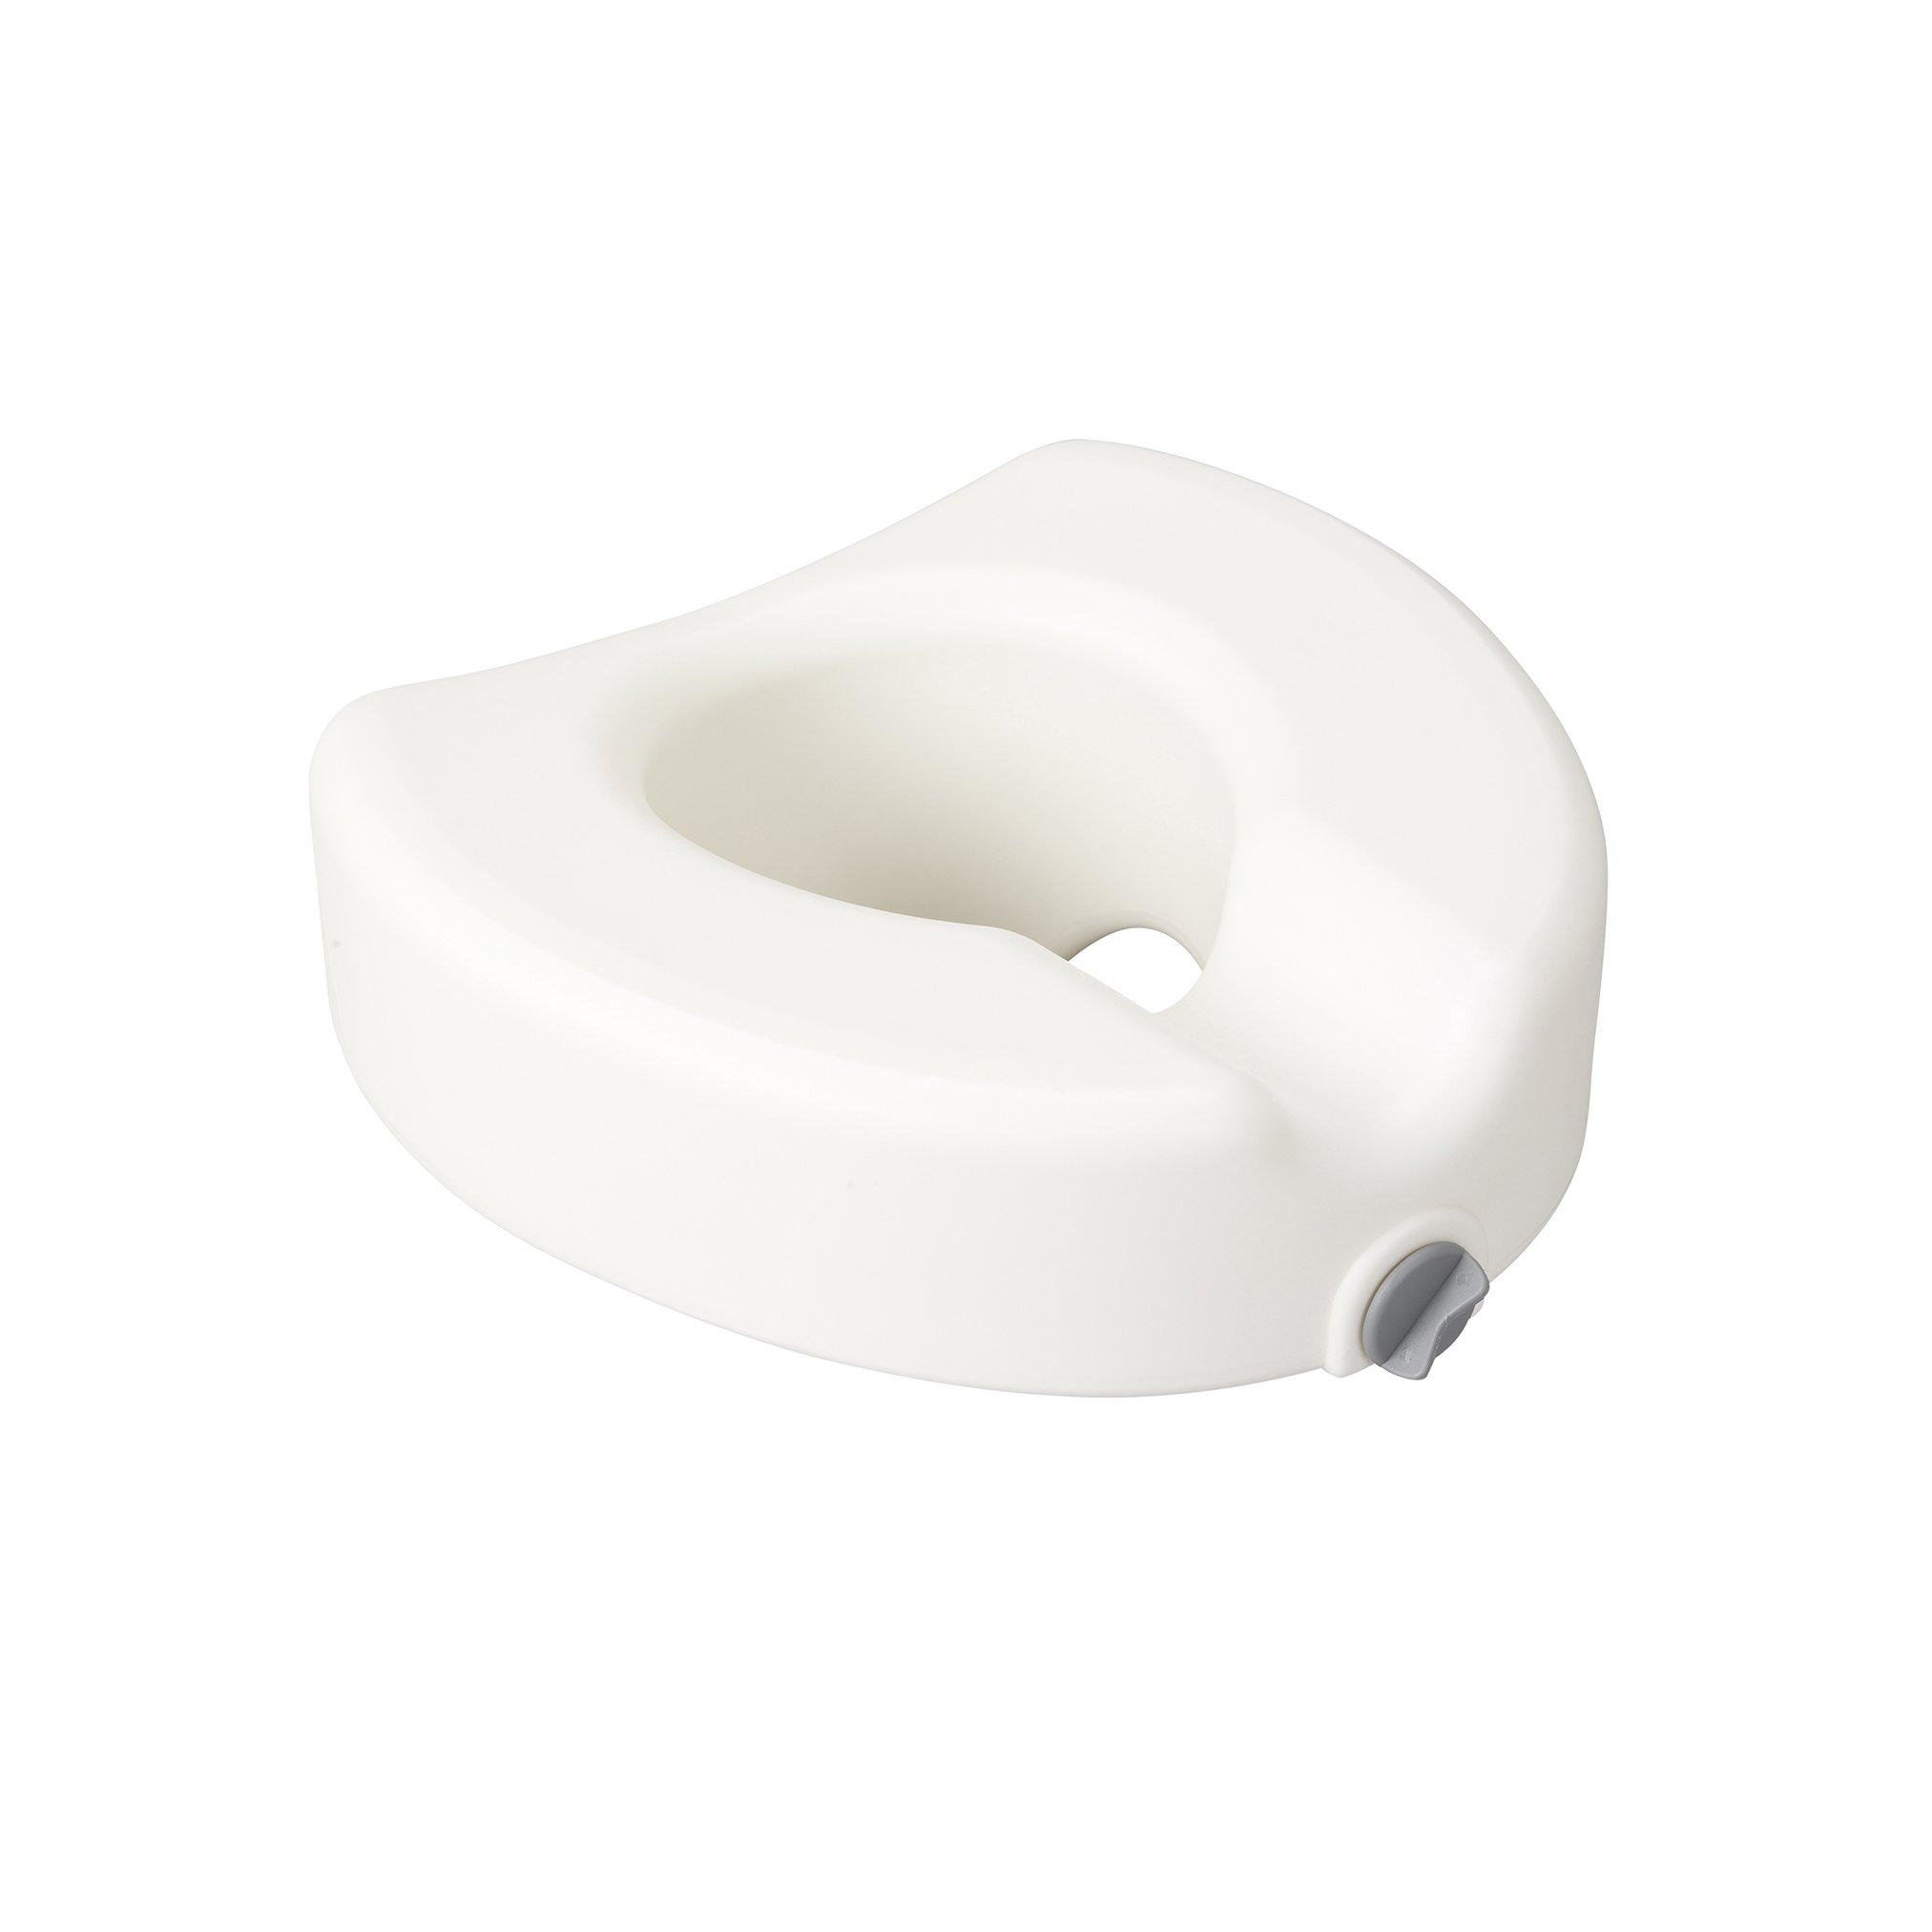 Drive Medical Premium Plastic Raised Toilet Seat with Lock, Elongated